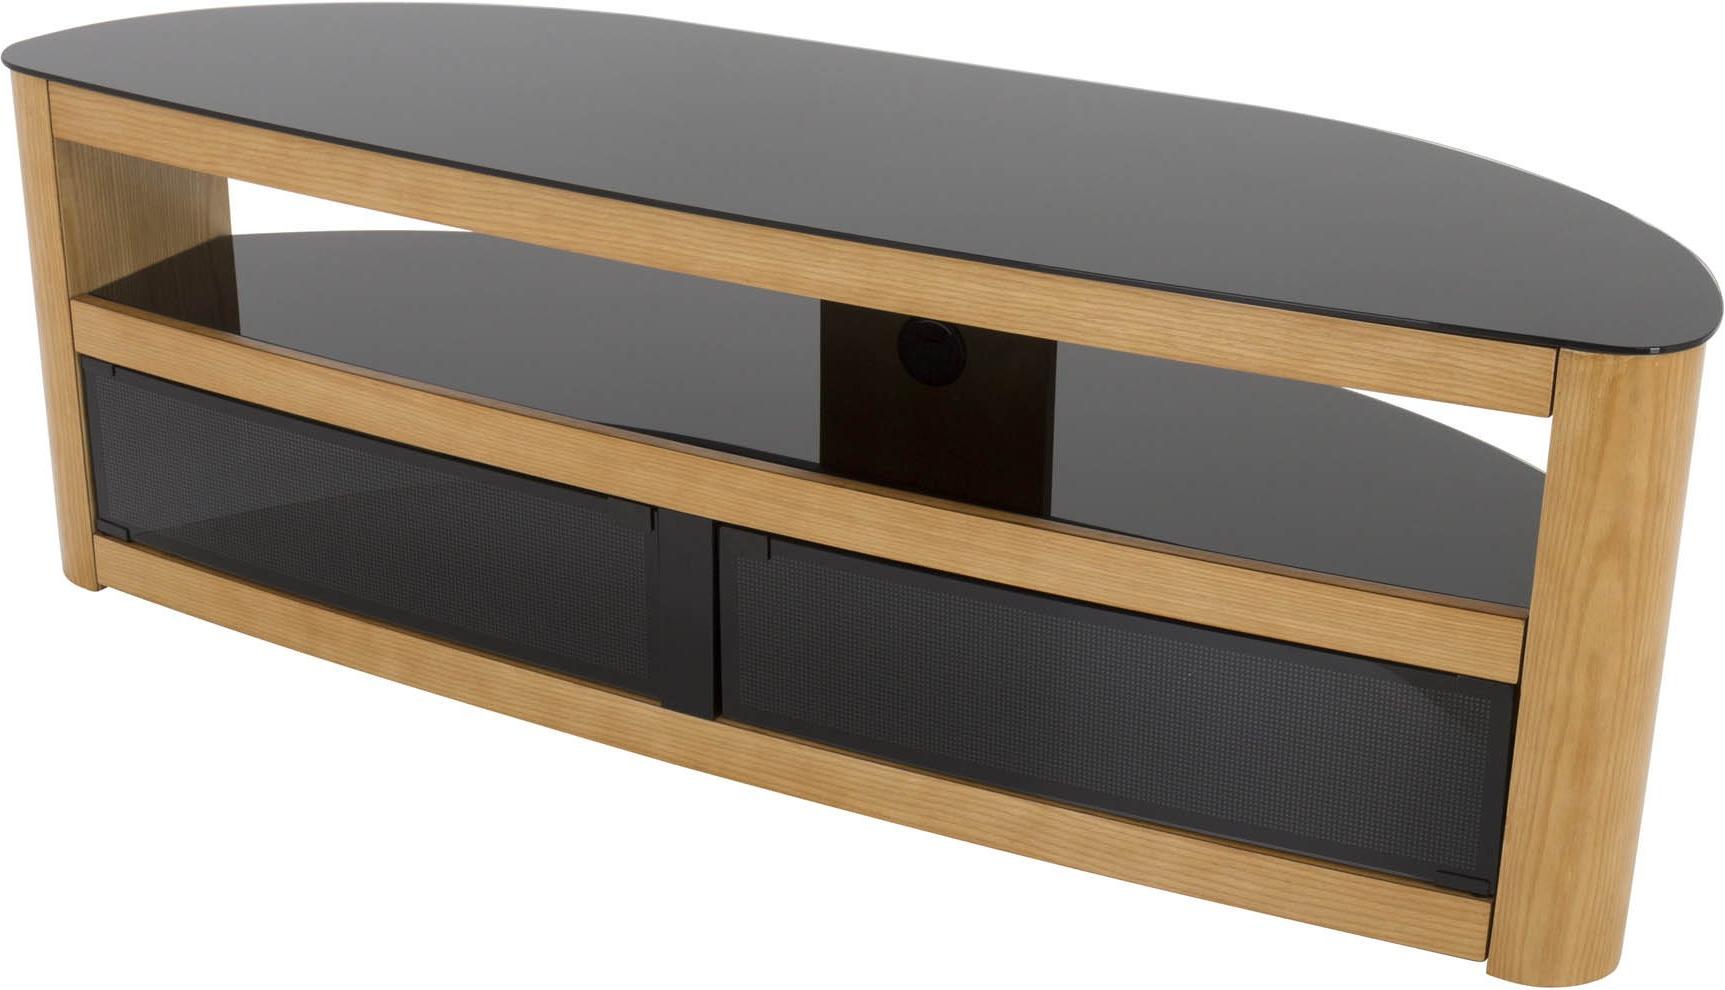 Newest Avf Fs1500Buro Tv Stands Regarding Avf Tv Stands (Gallery 2 of 20)